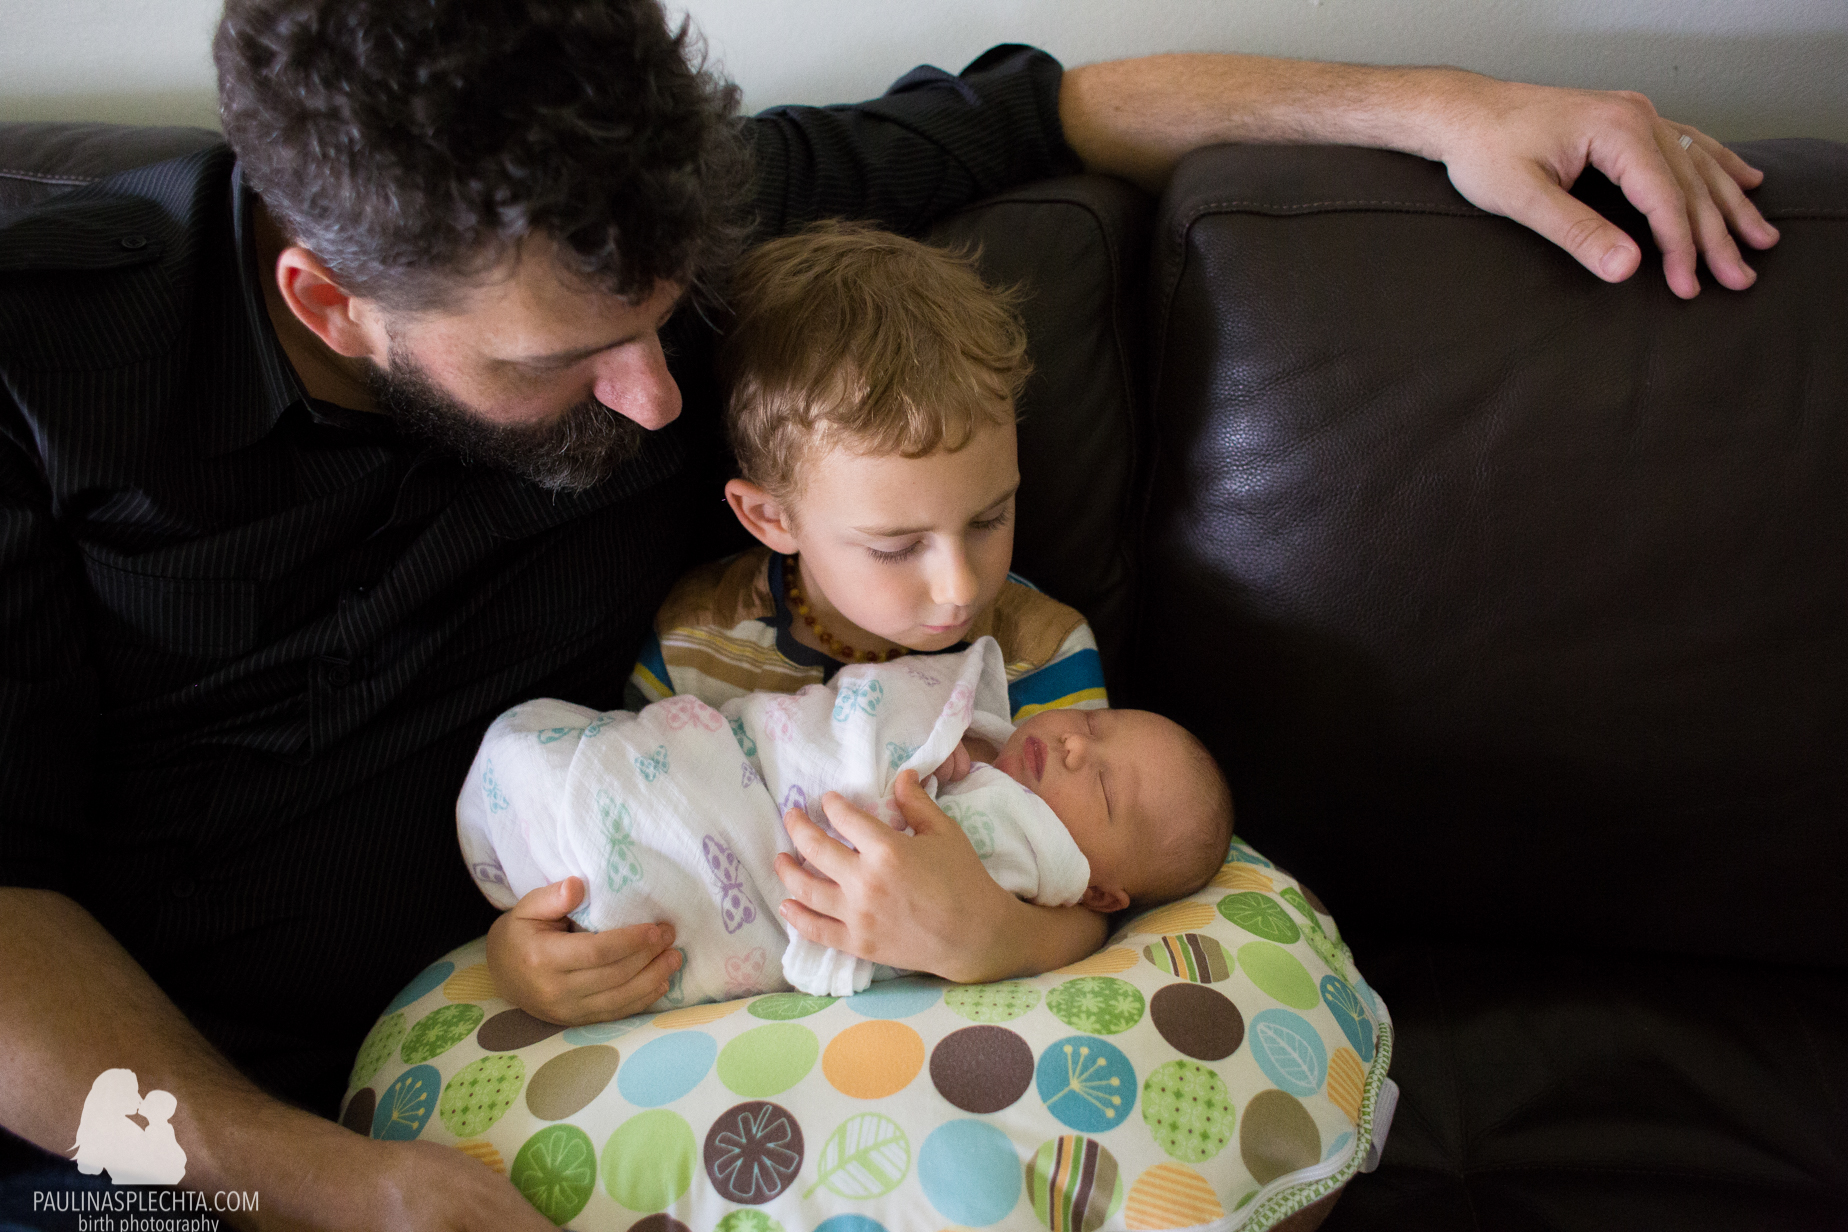 familyphotographer-babyphotographer-newbornphotographer-birth-bocaregional-ob-midwife-doula-hypnobirthing-birthphotographer-maternityphotos-bocaraton-maryharris-3.jpg